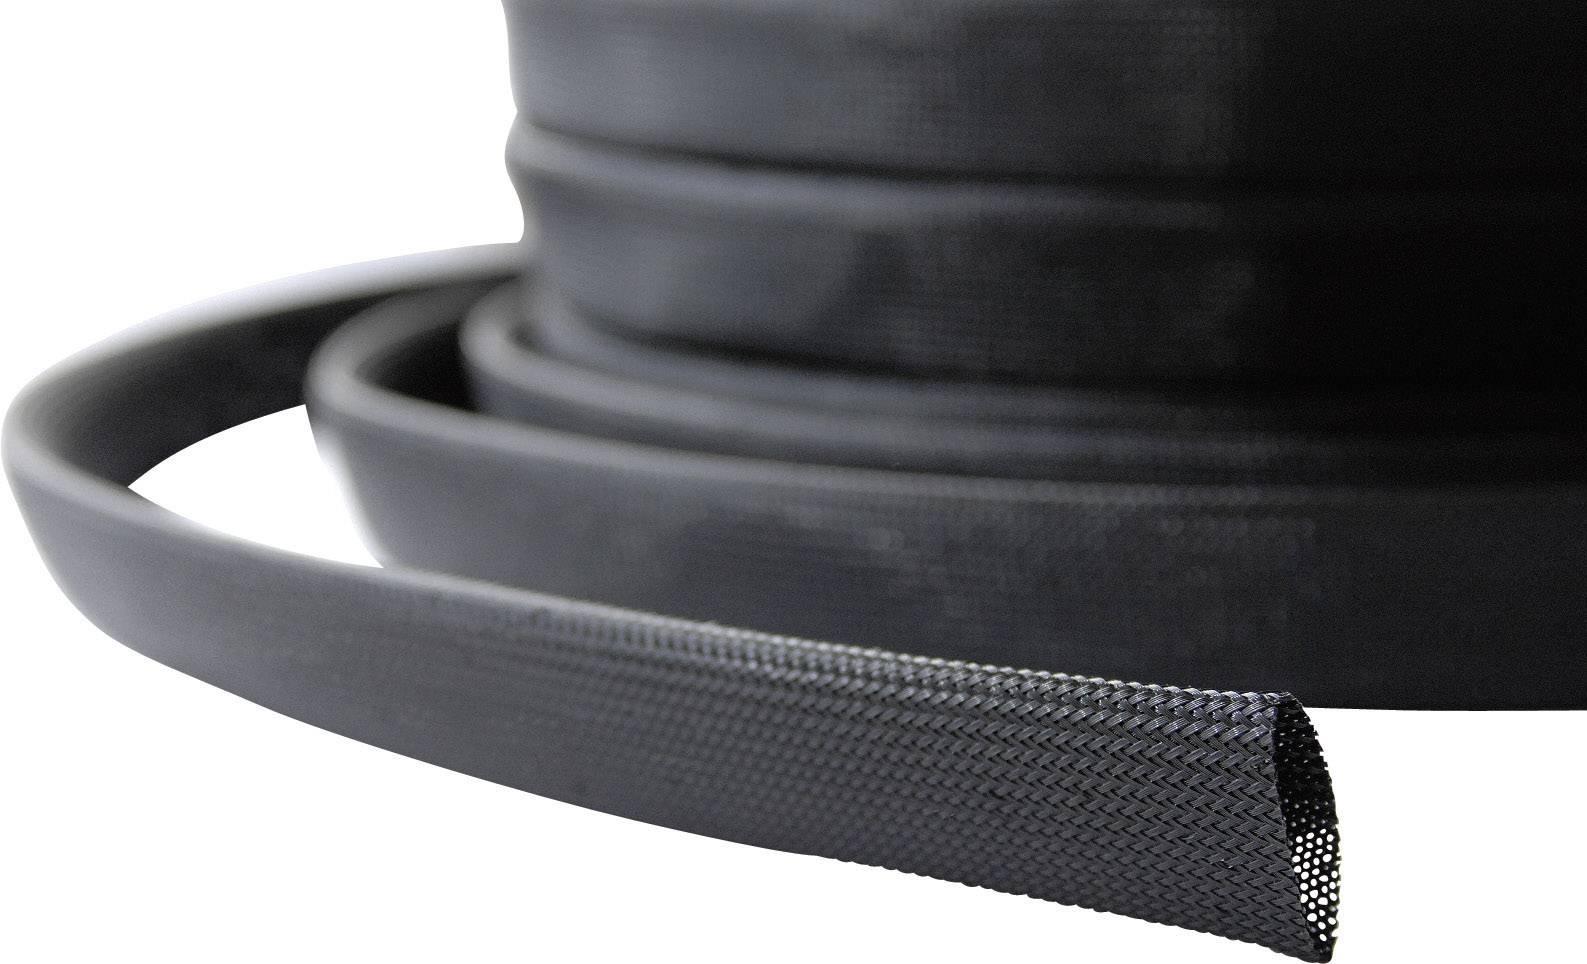 Ochranný oplet LappKabel SILVYN® BRAID PA6 NW, 18 do 26 mm, -55 do +125 °C, 10 m, čierna